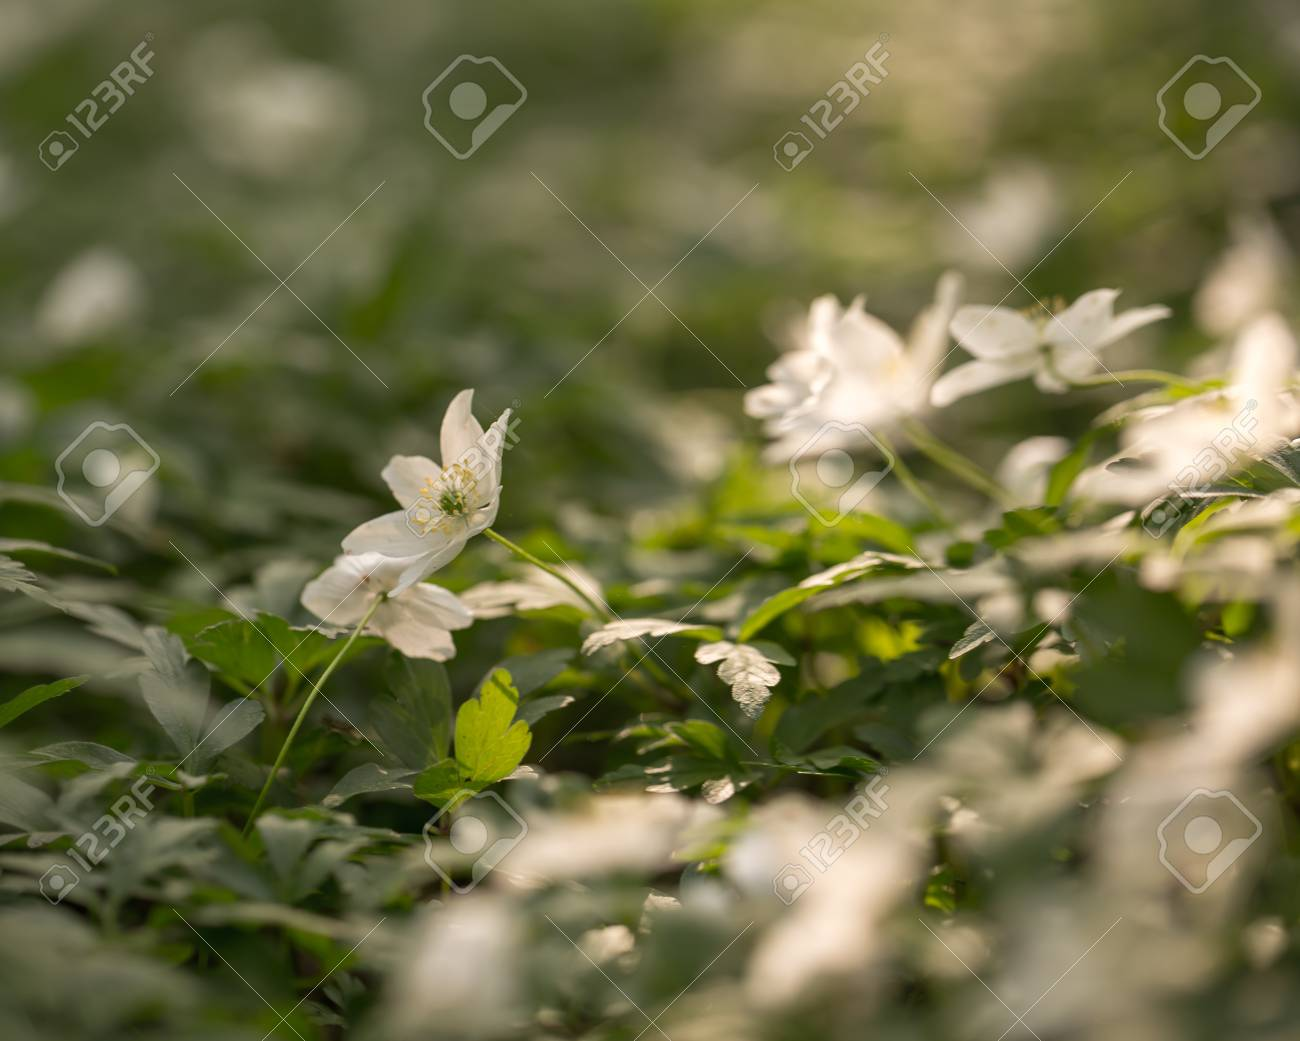 White anemone flowers blooming in springtime forest in poland stock photo white anemone flowers blooming in springtime forest in poland wild white flowers mightylinksfo